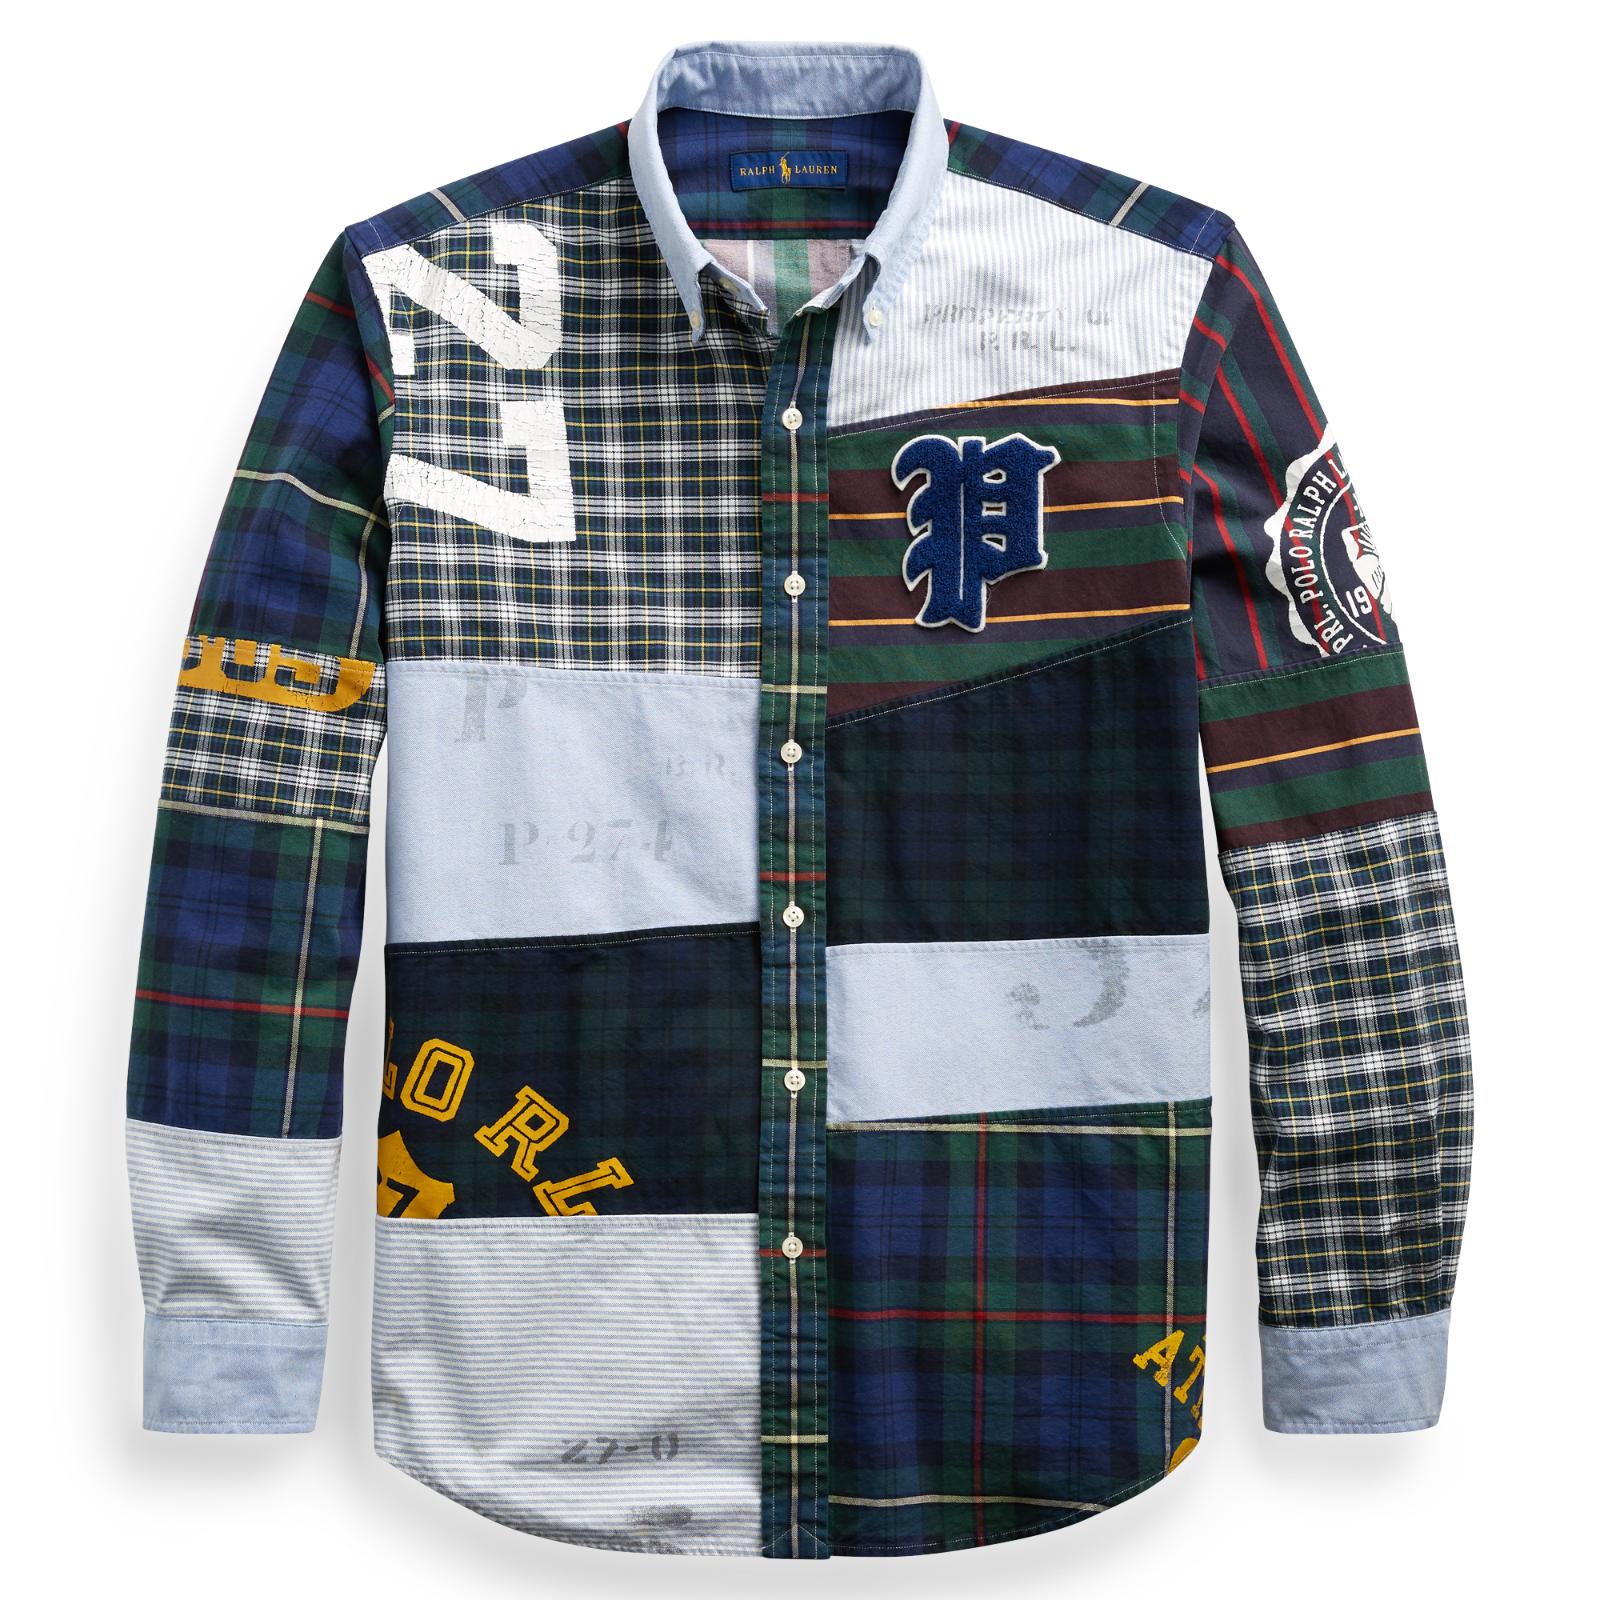 b5cdcce2 Details about Mens Polo Ralph Lauren Classic Fit Patchwork Stadium Oxford  Fun Shirt Sizes L XL